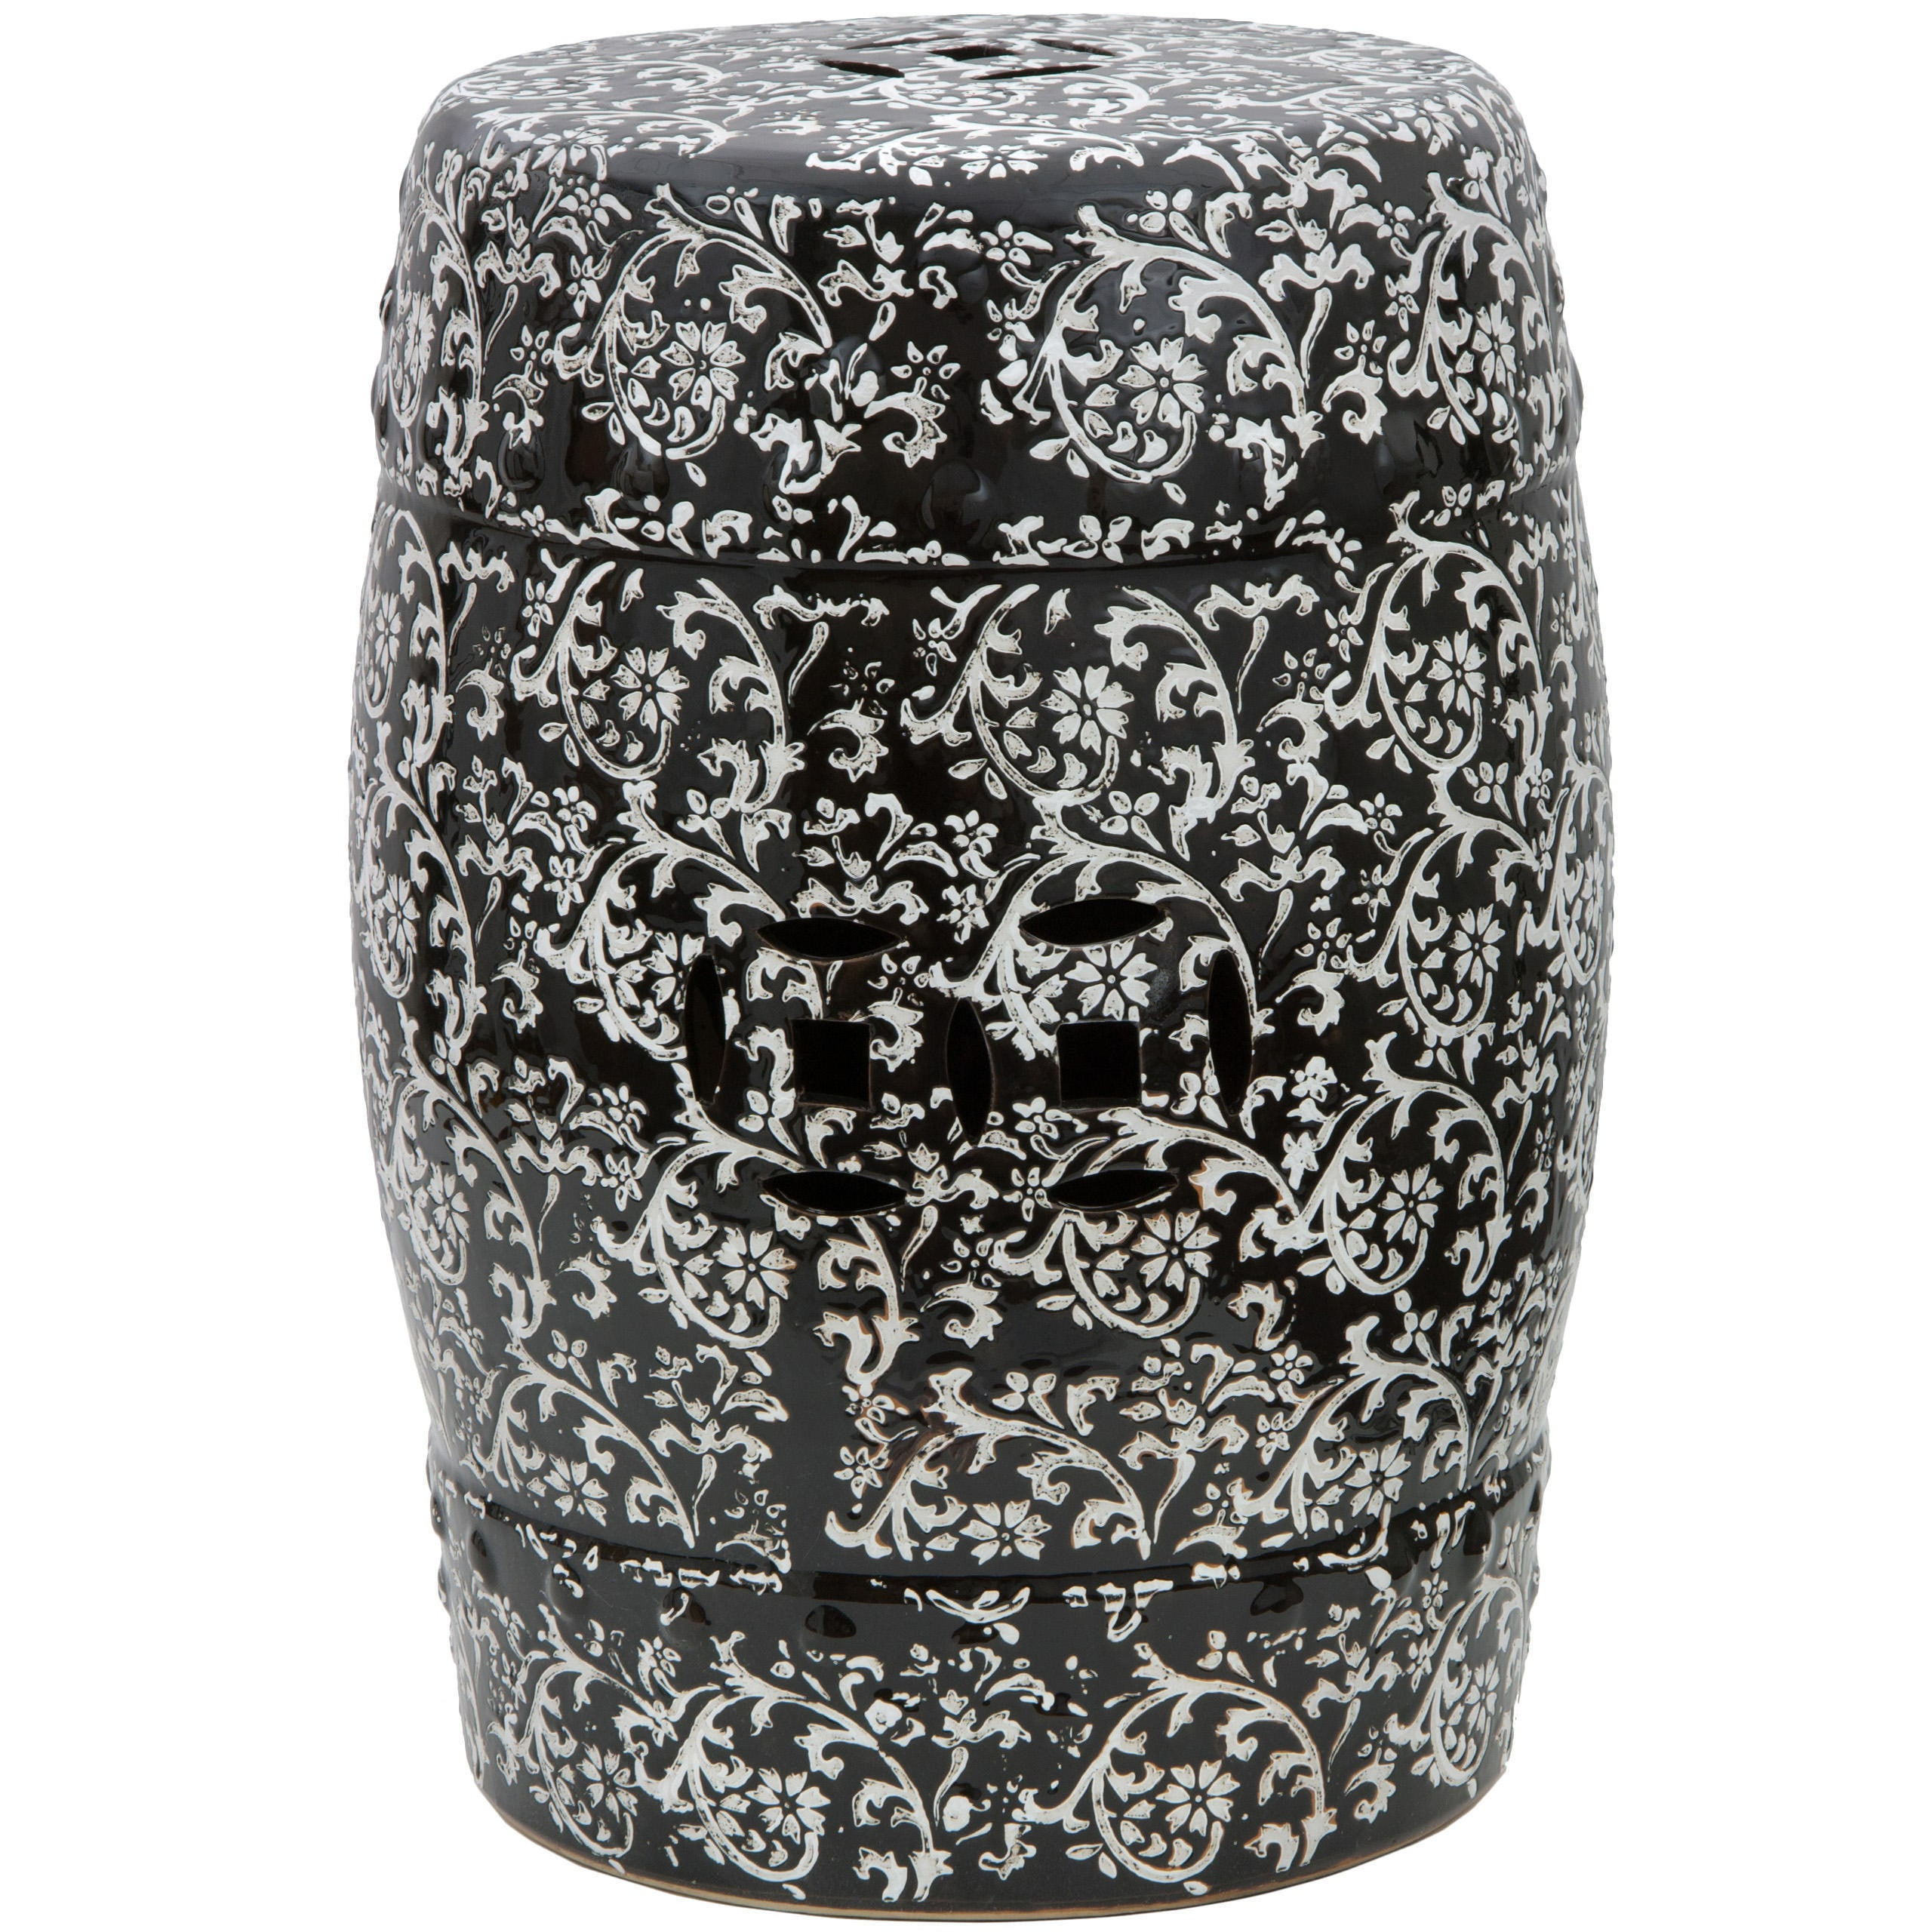 Popular Renee Porcelain Garden Stools For Handmade Black And White Floral Porcelain Garden Stool (View 21 of 30)